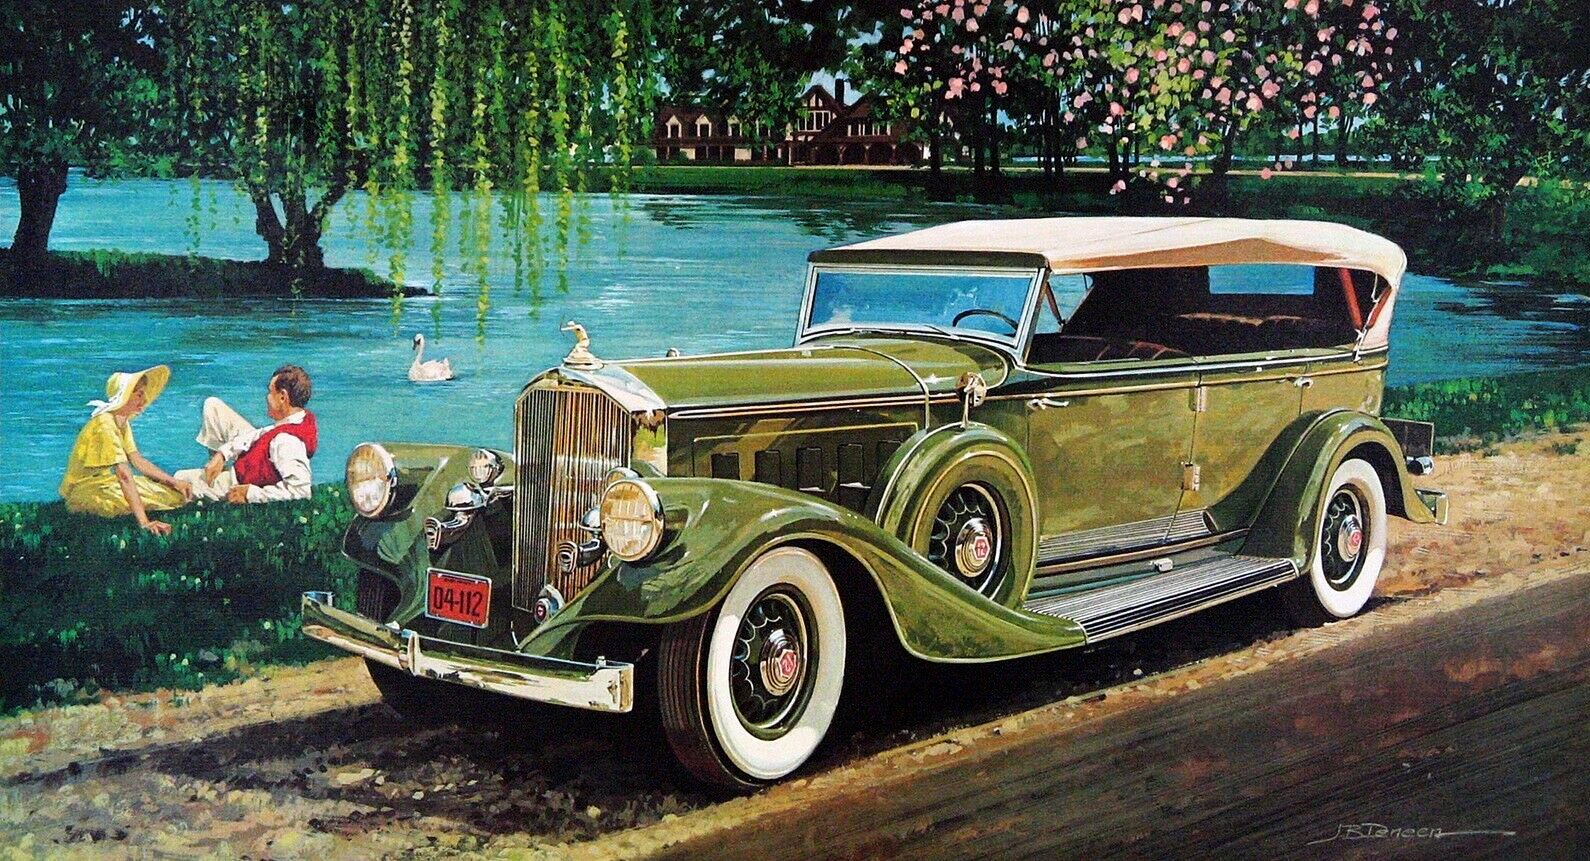 1933. Pierce Arrow Seven Passenger Touring Car. Illustrated by James B. Deneen